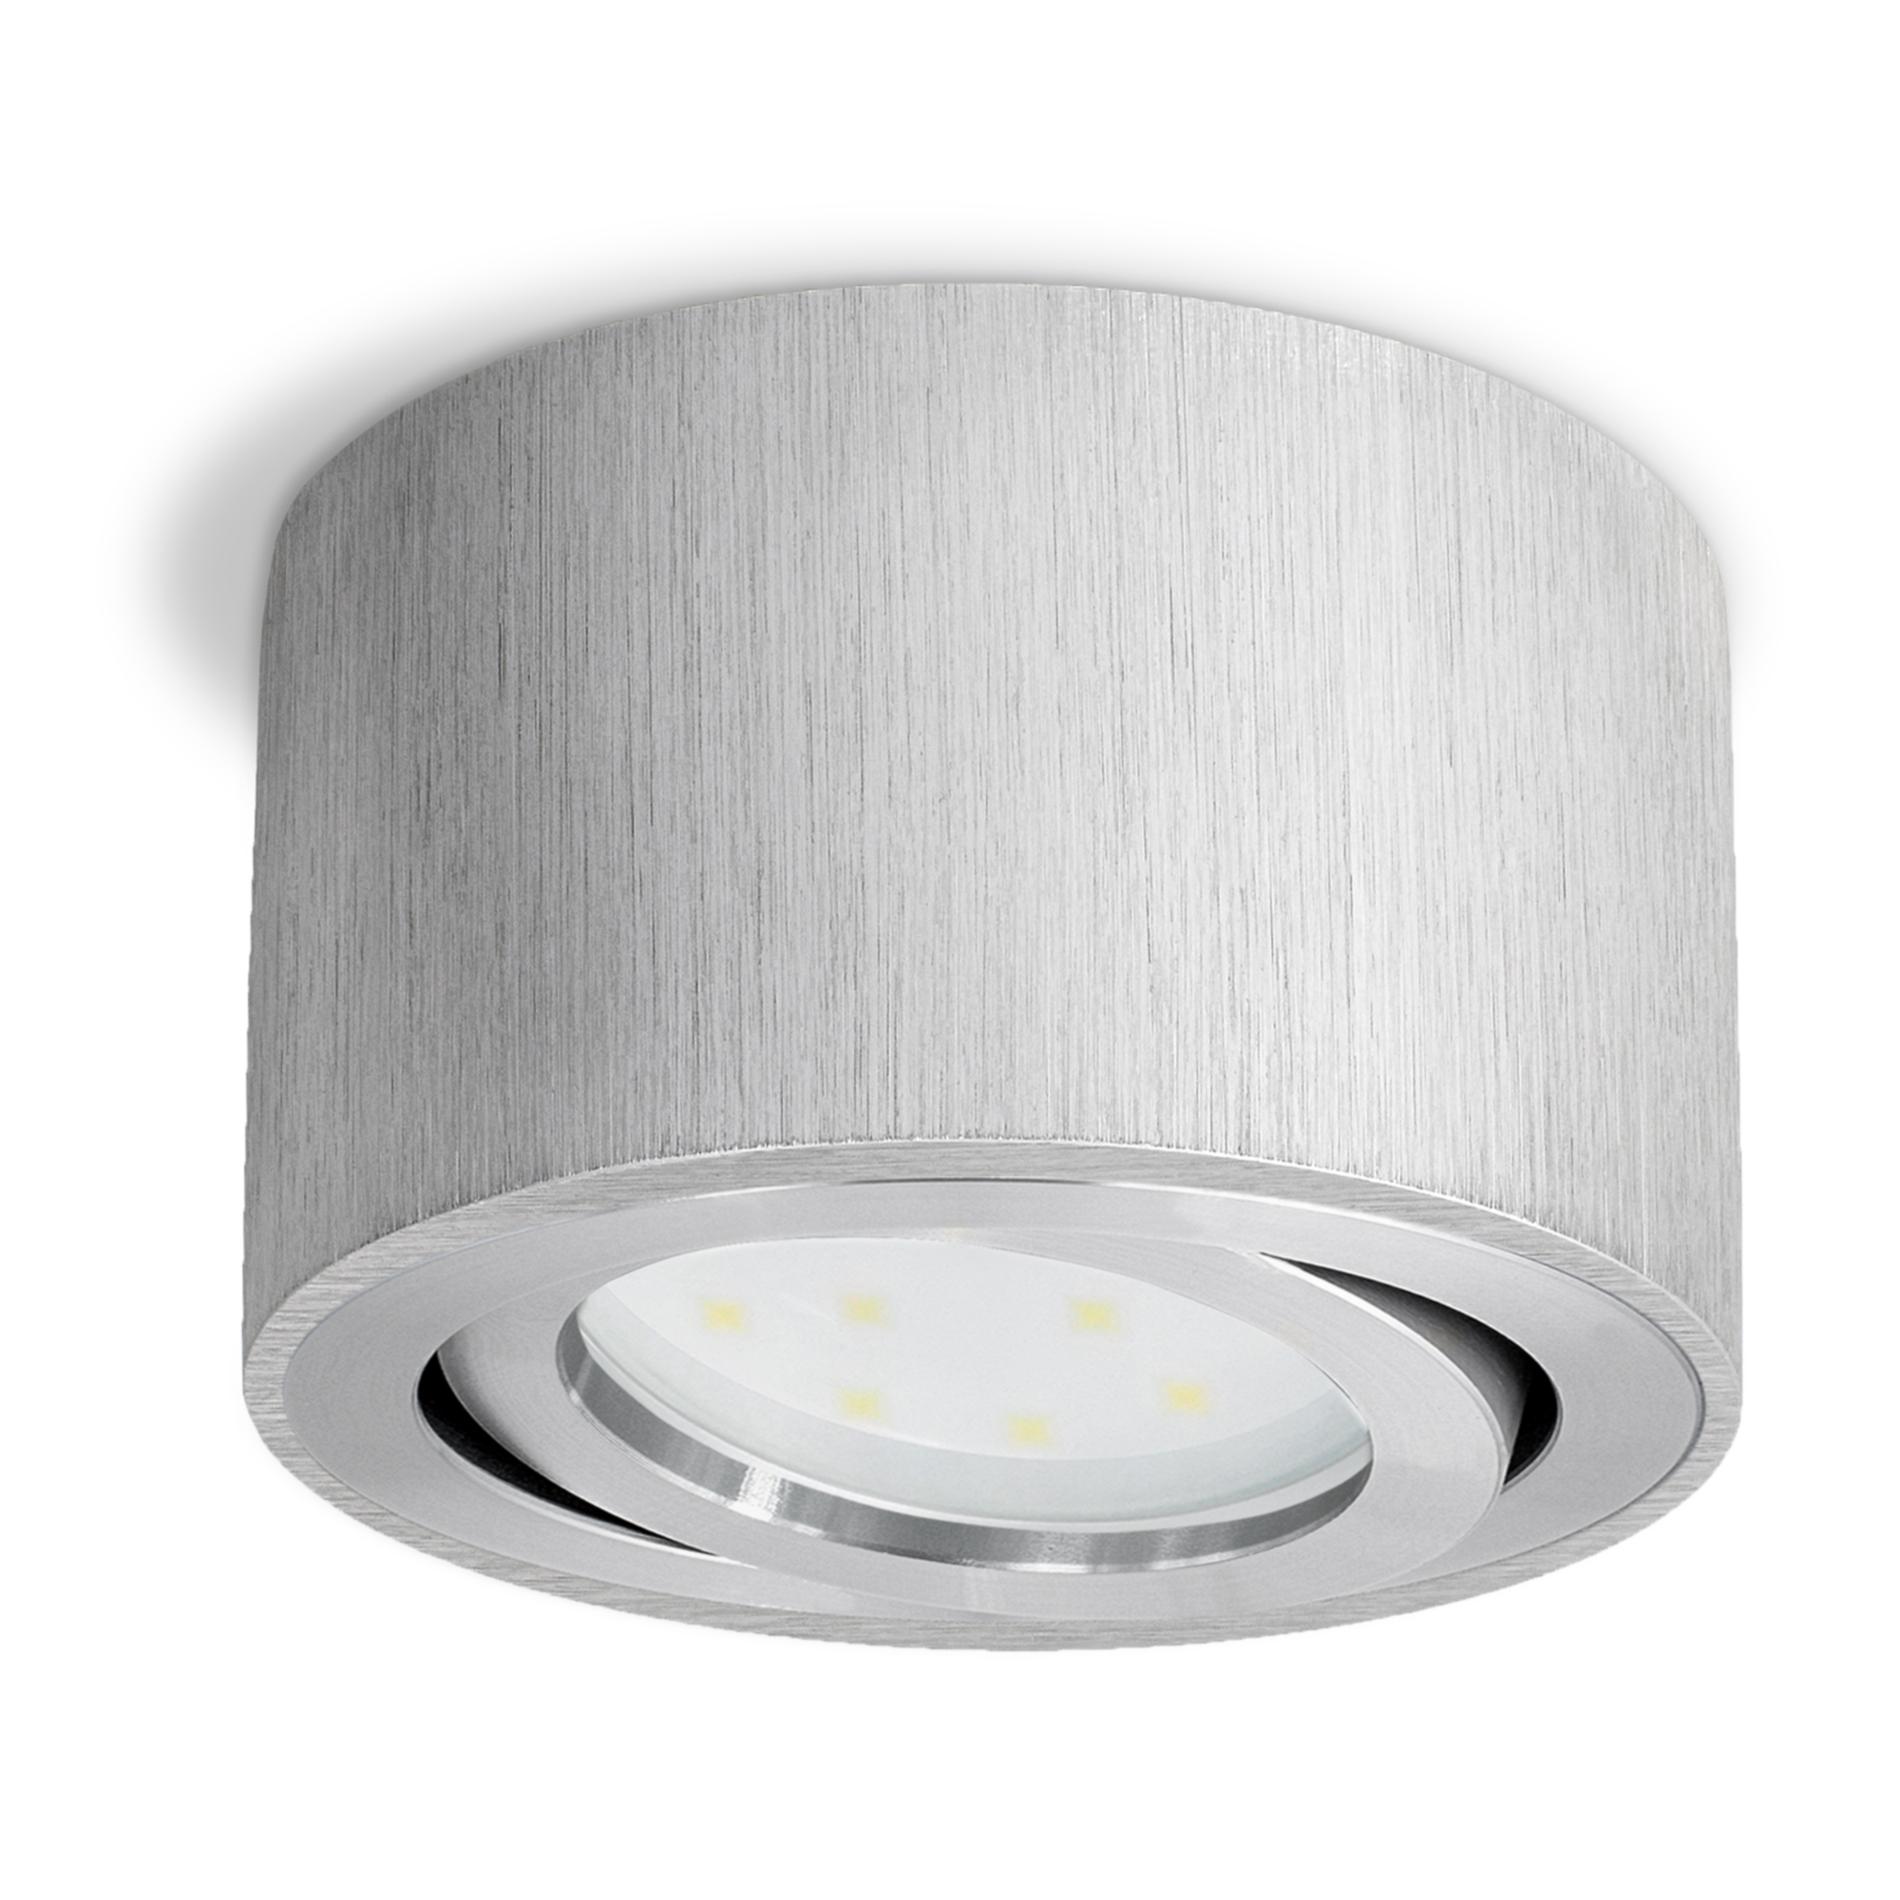 LED 5W Aufbaustrahler Aufbau Leuchte Aufputz Strahler Spot 50mm 230V dimmbar